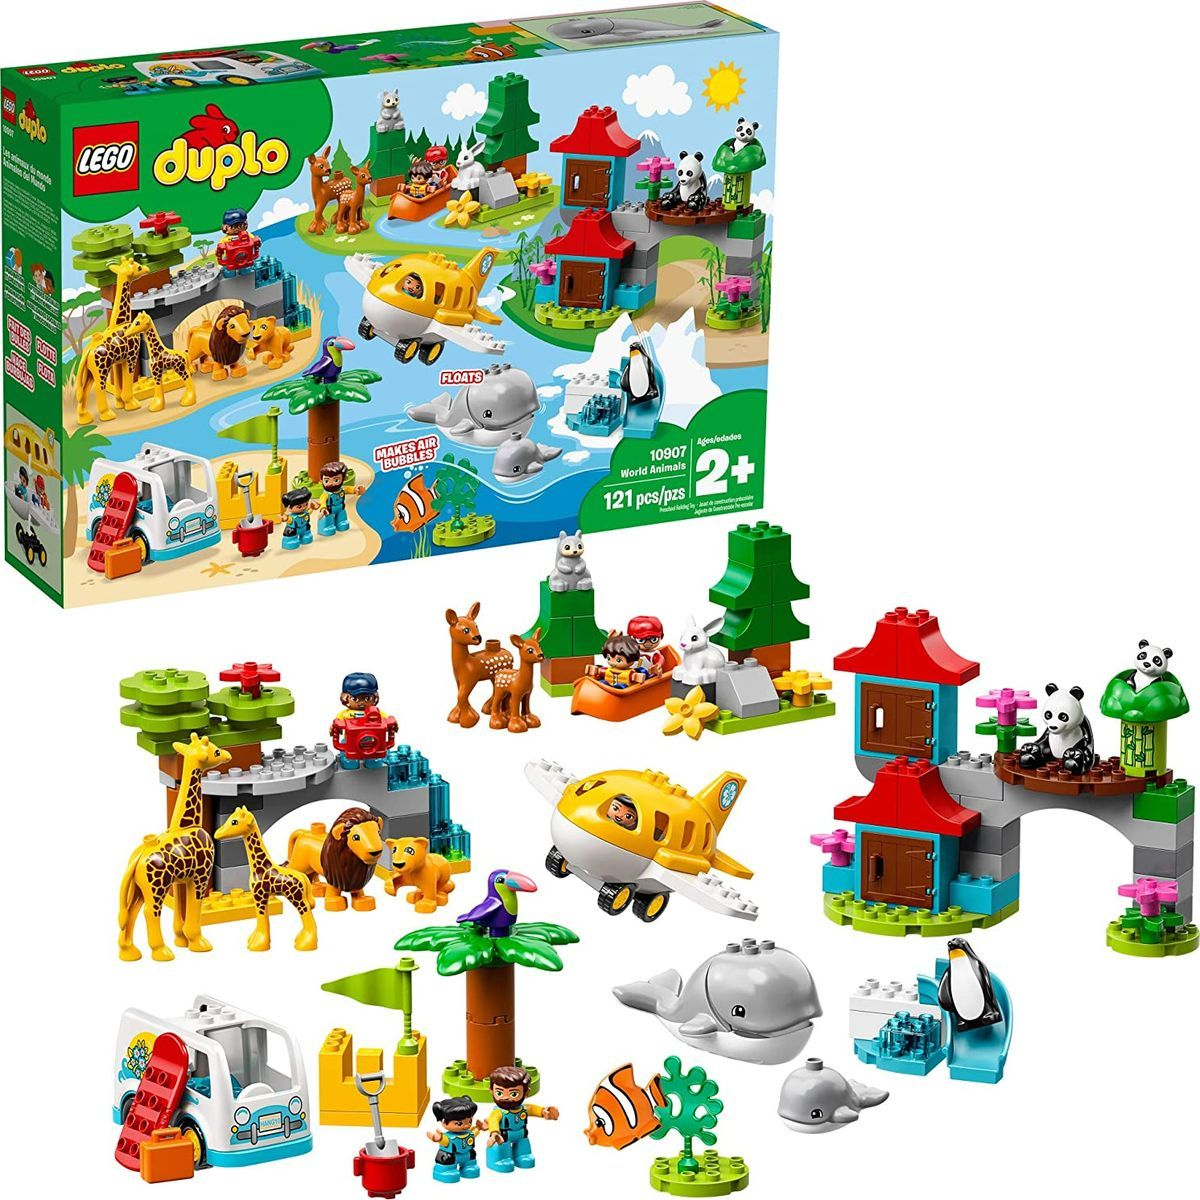 LEGO® DUPLO® Town 10907 Zvieratá sveta